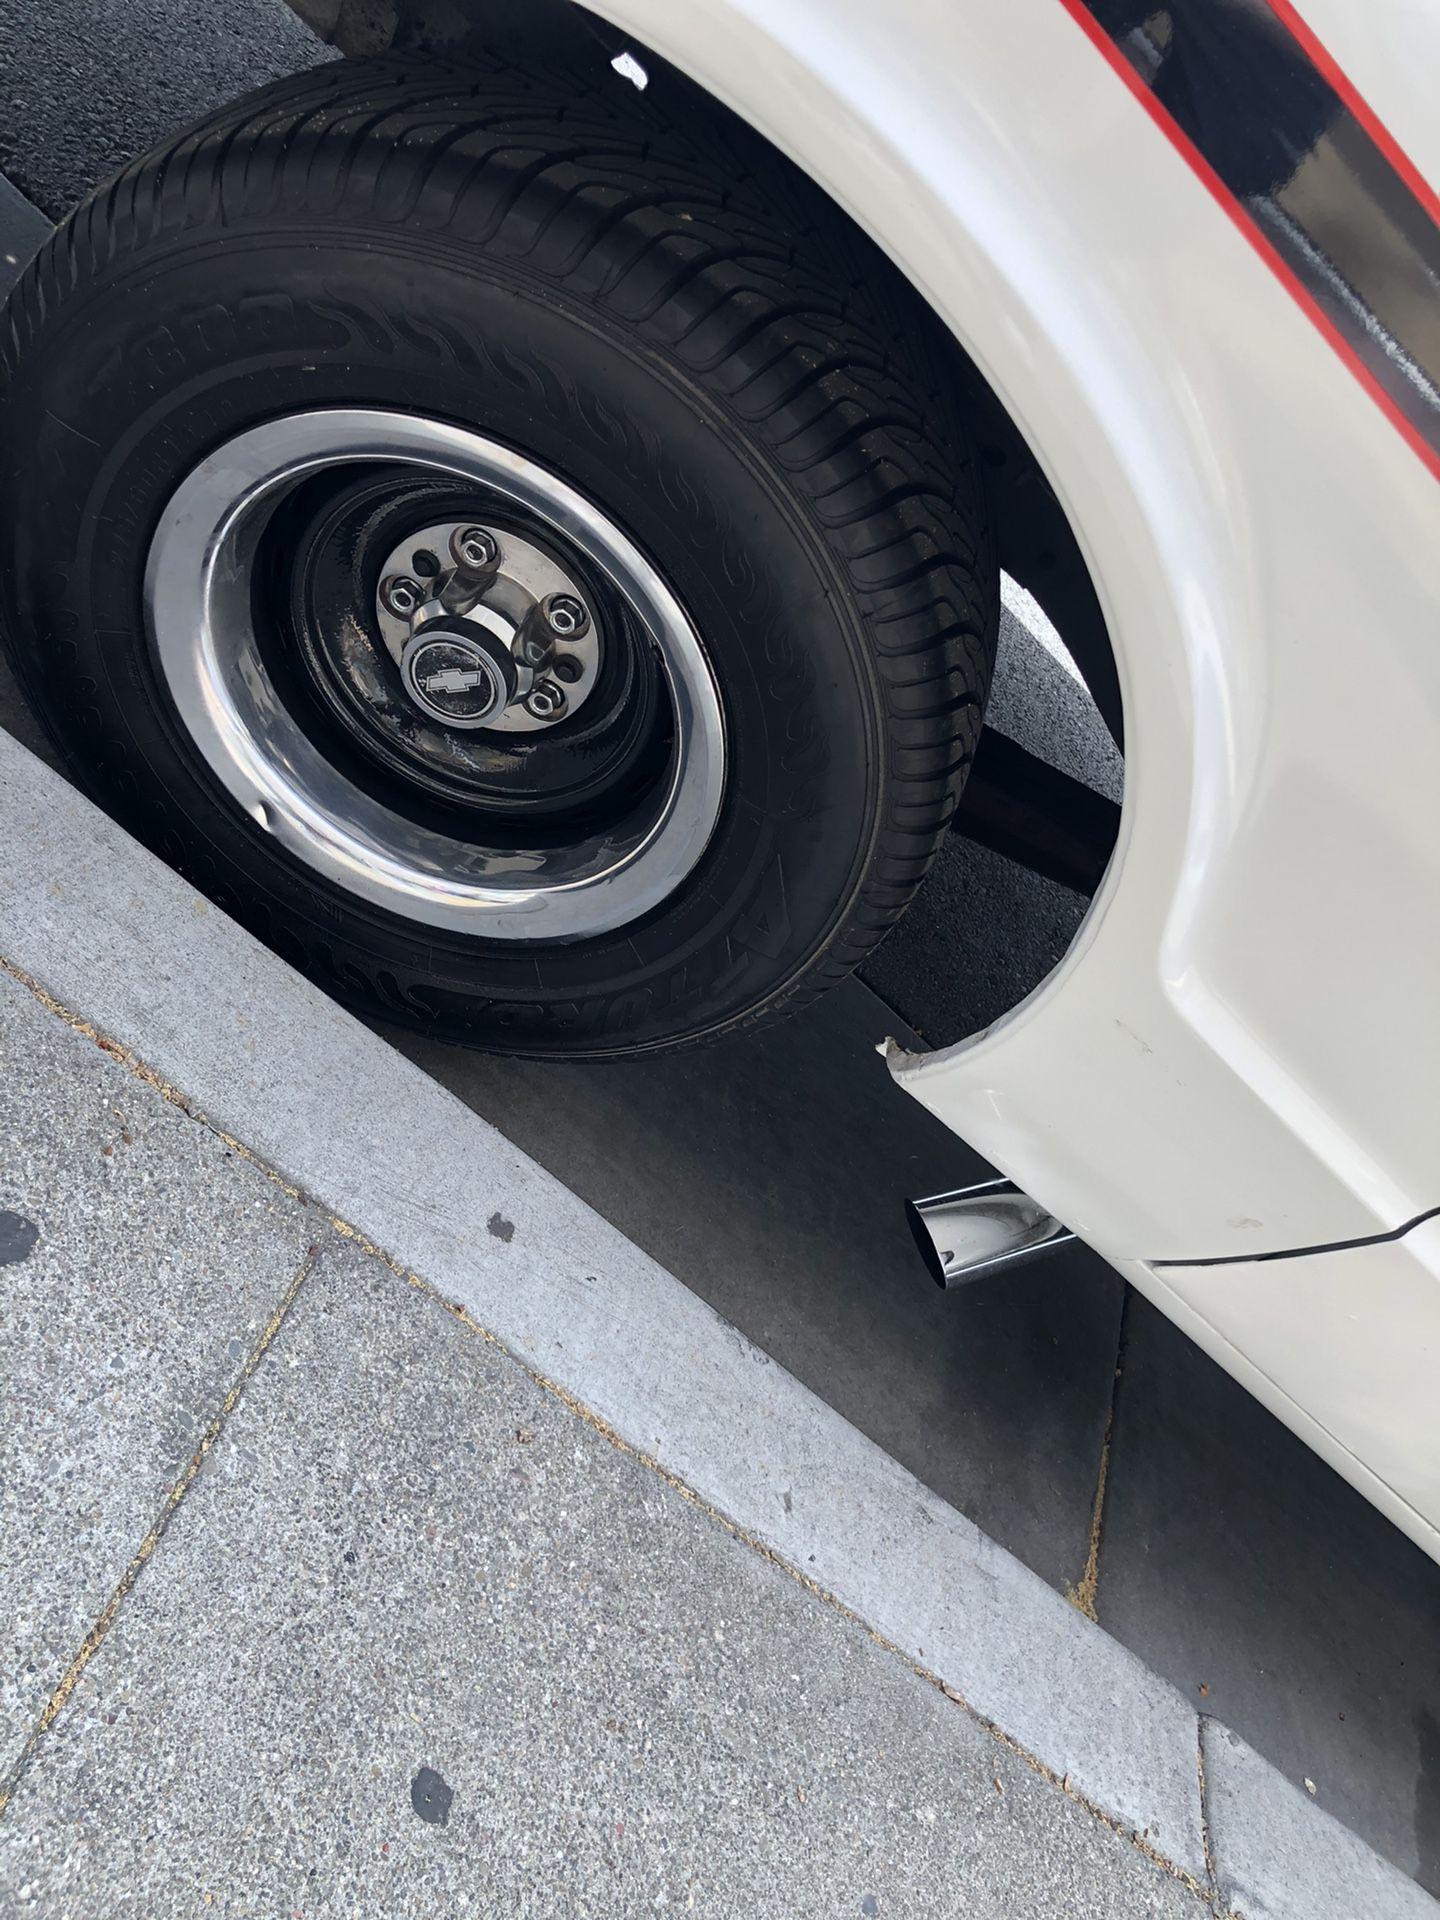 1969 Chevy Suburban